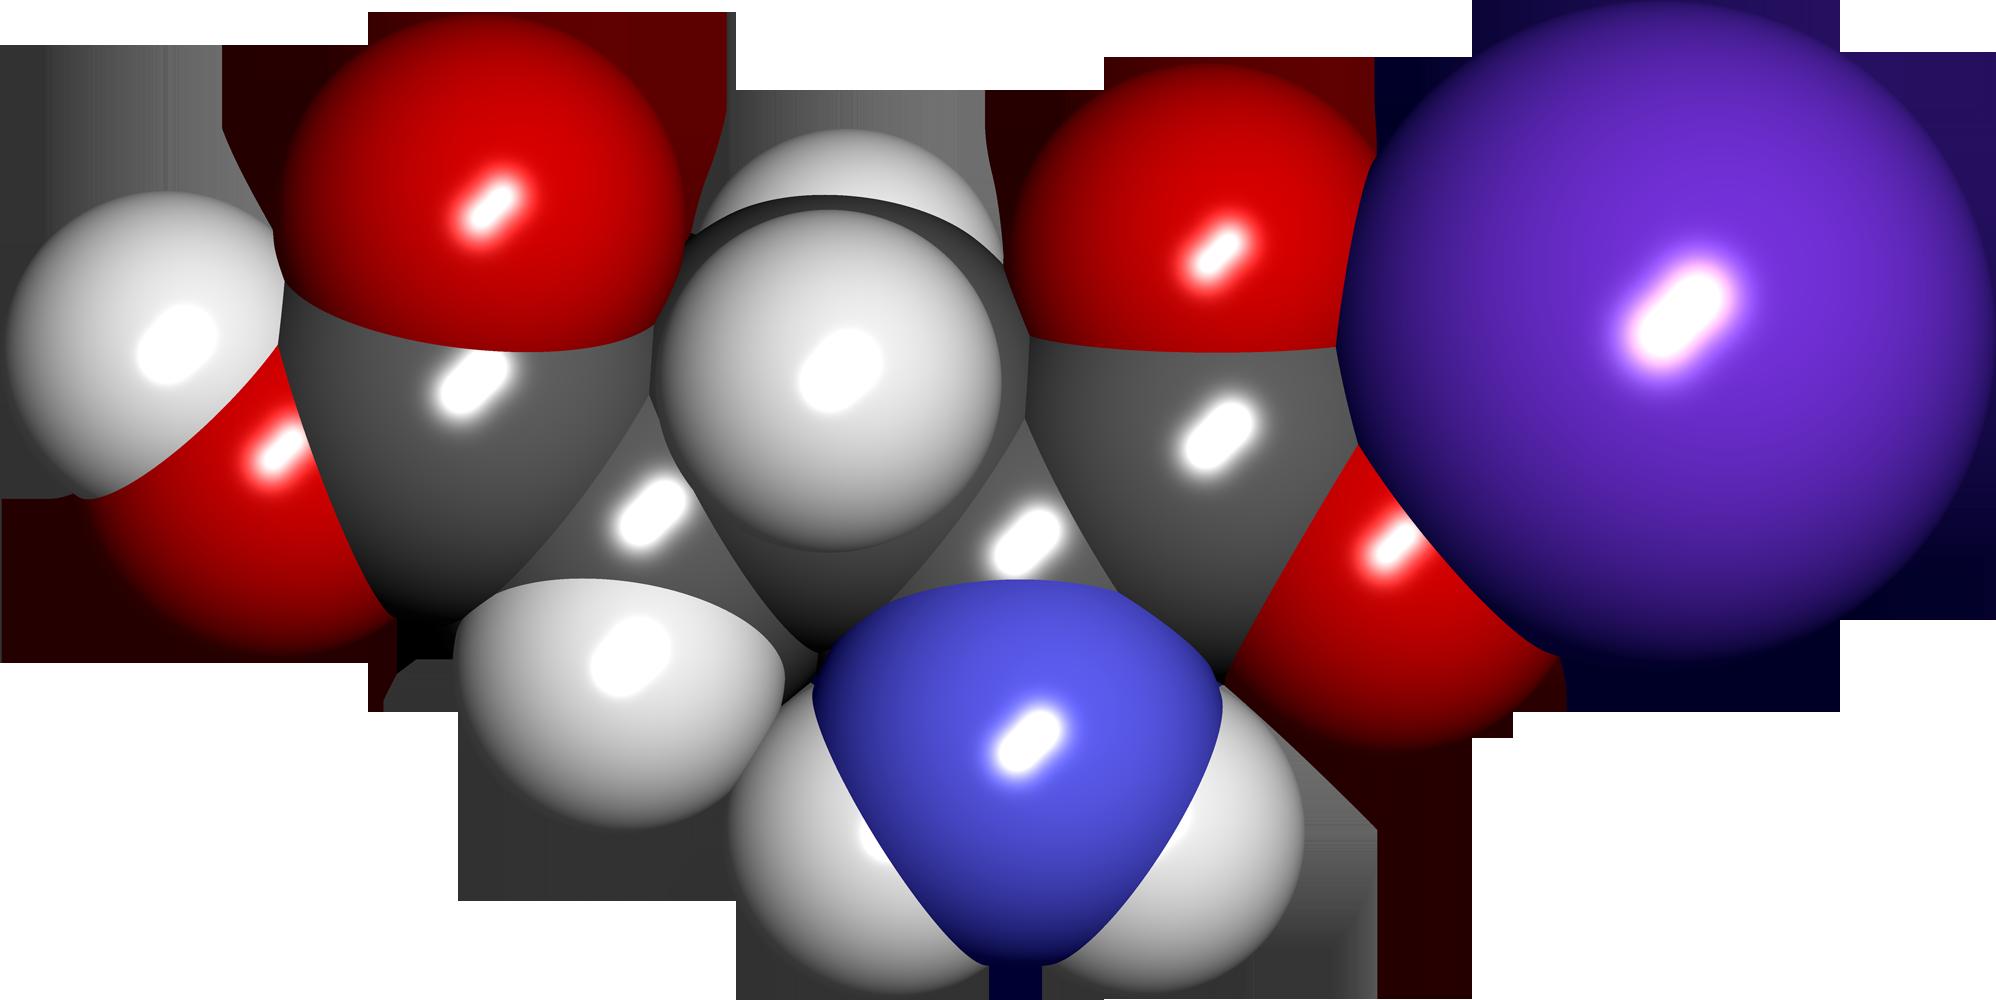 monosodium glutamate No—glutamate or glutamic acid have nothing to do with gluten 7.